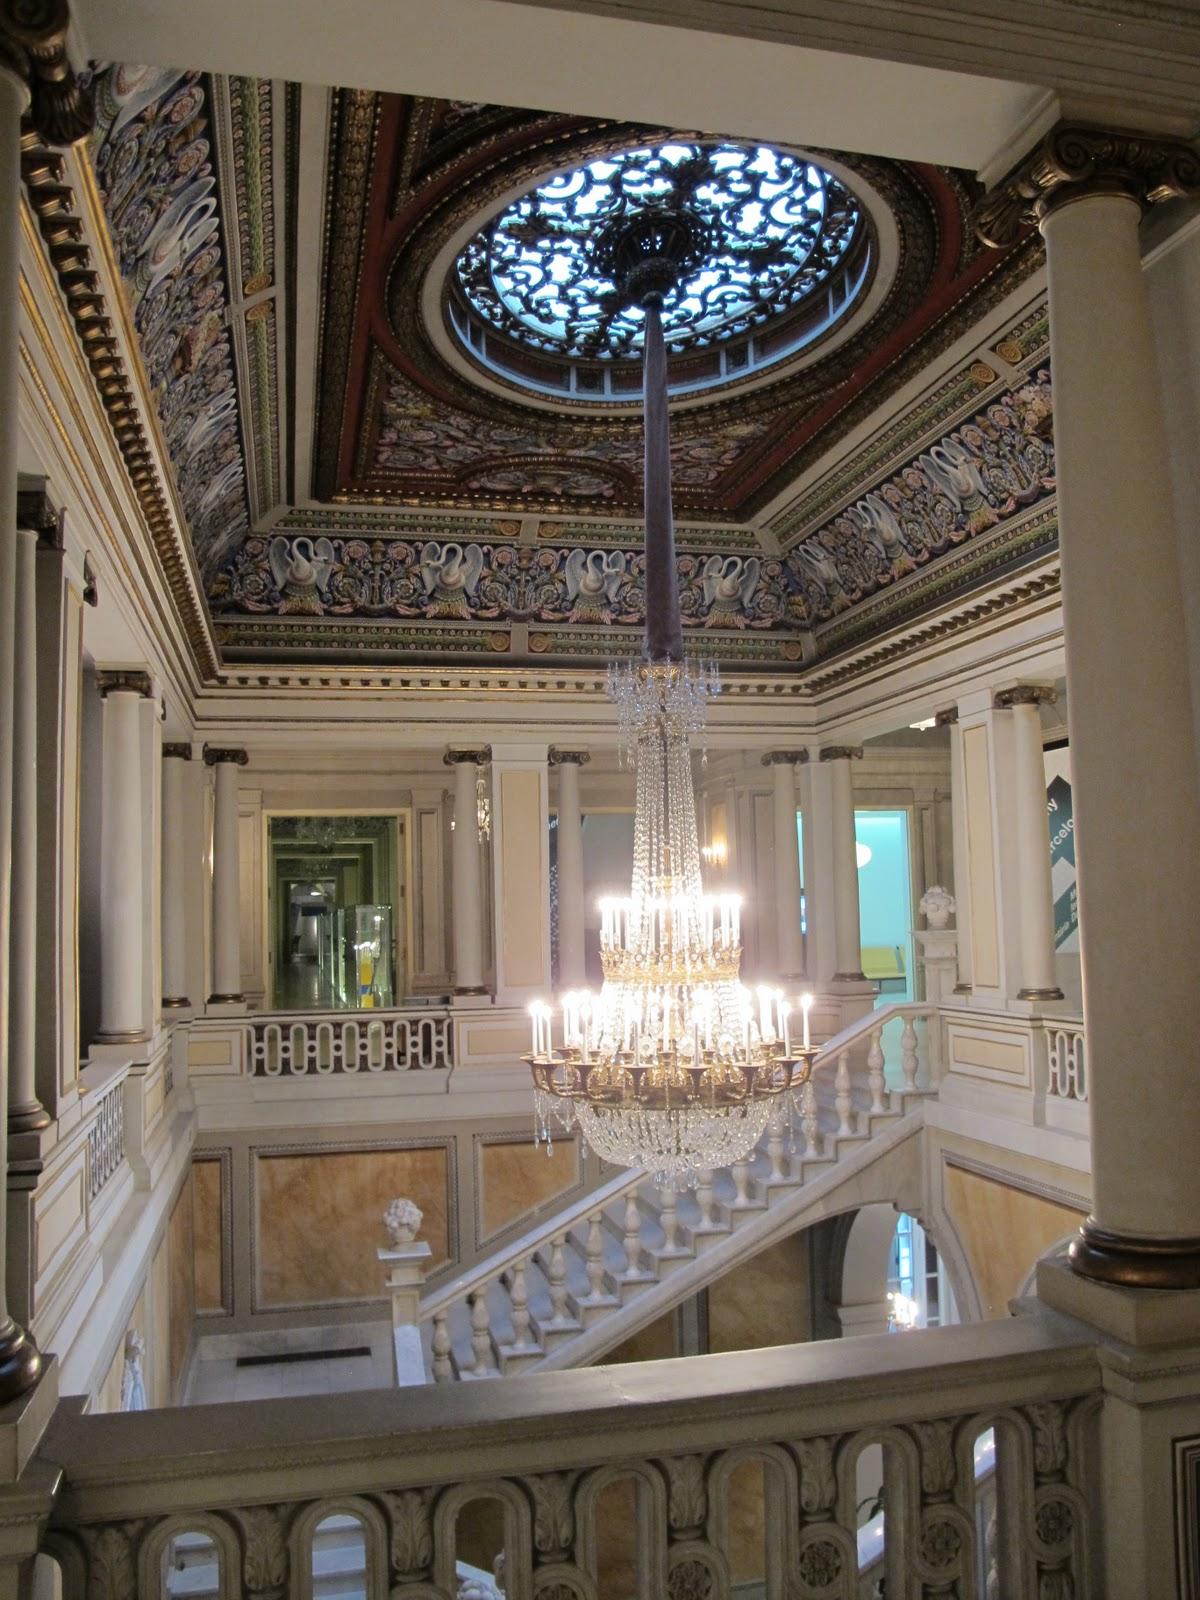 Robin Talks Cooks and Travels Palau Reial de Pedrables